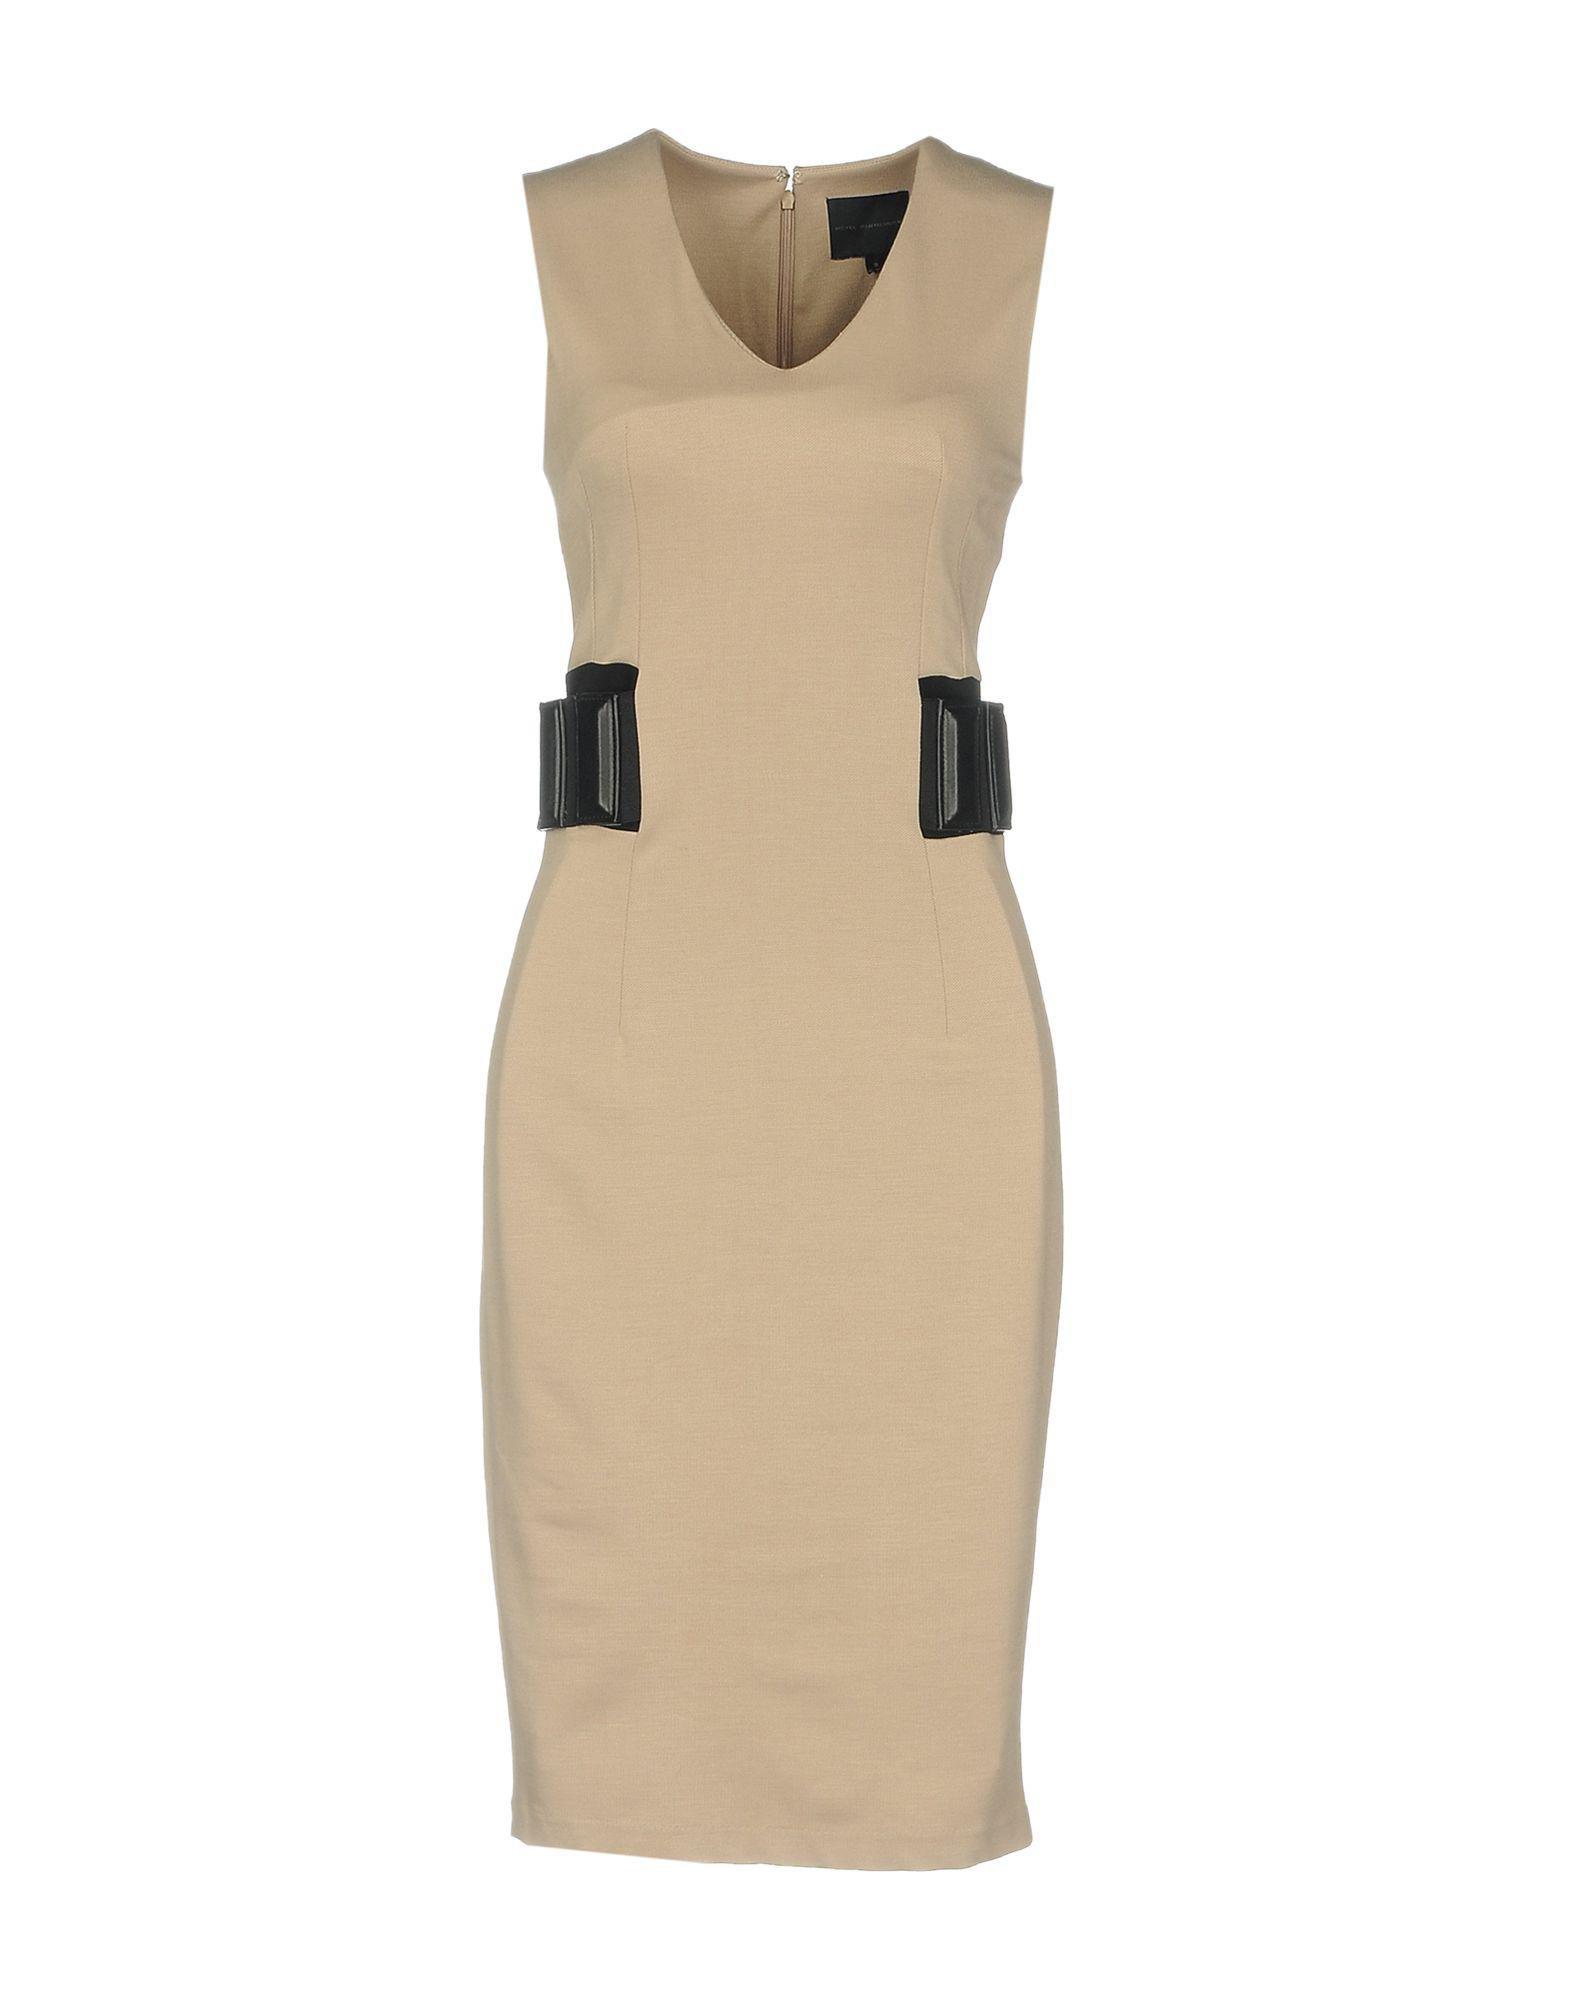 DRESSES - Short dresses Hotel Particulier vucBOKx